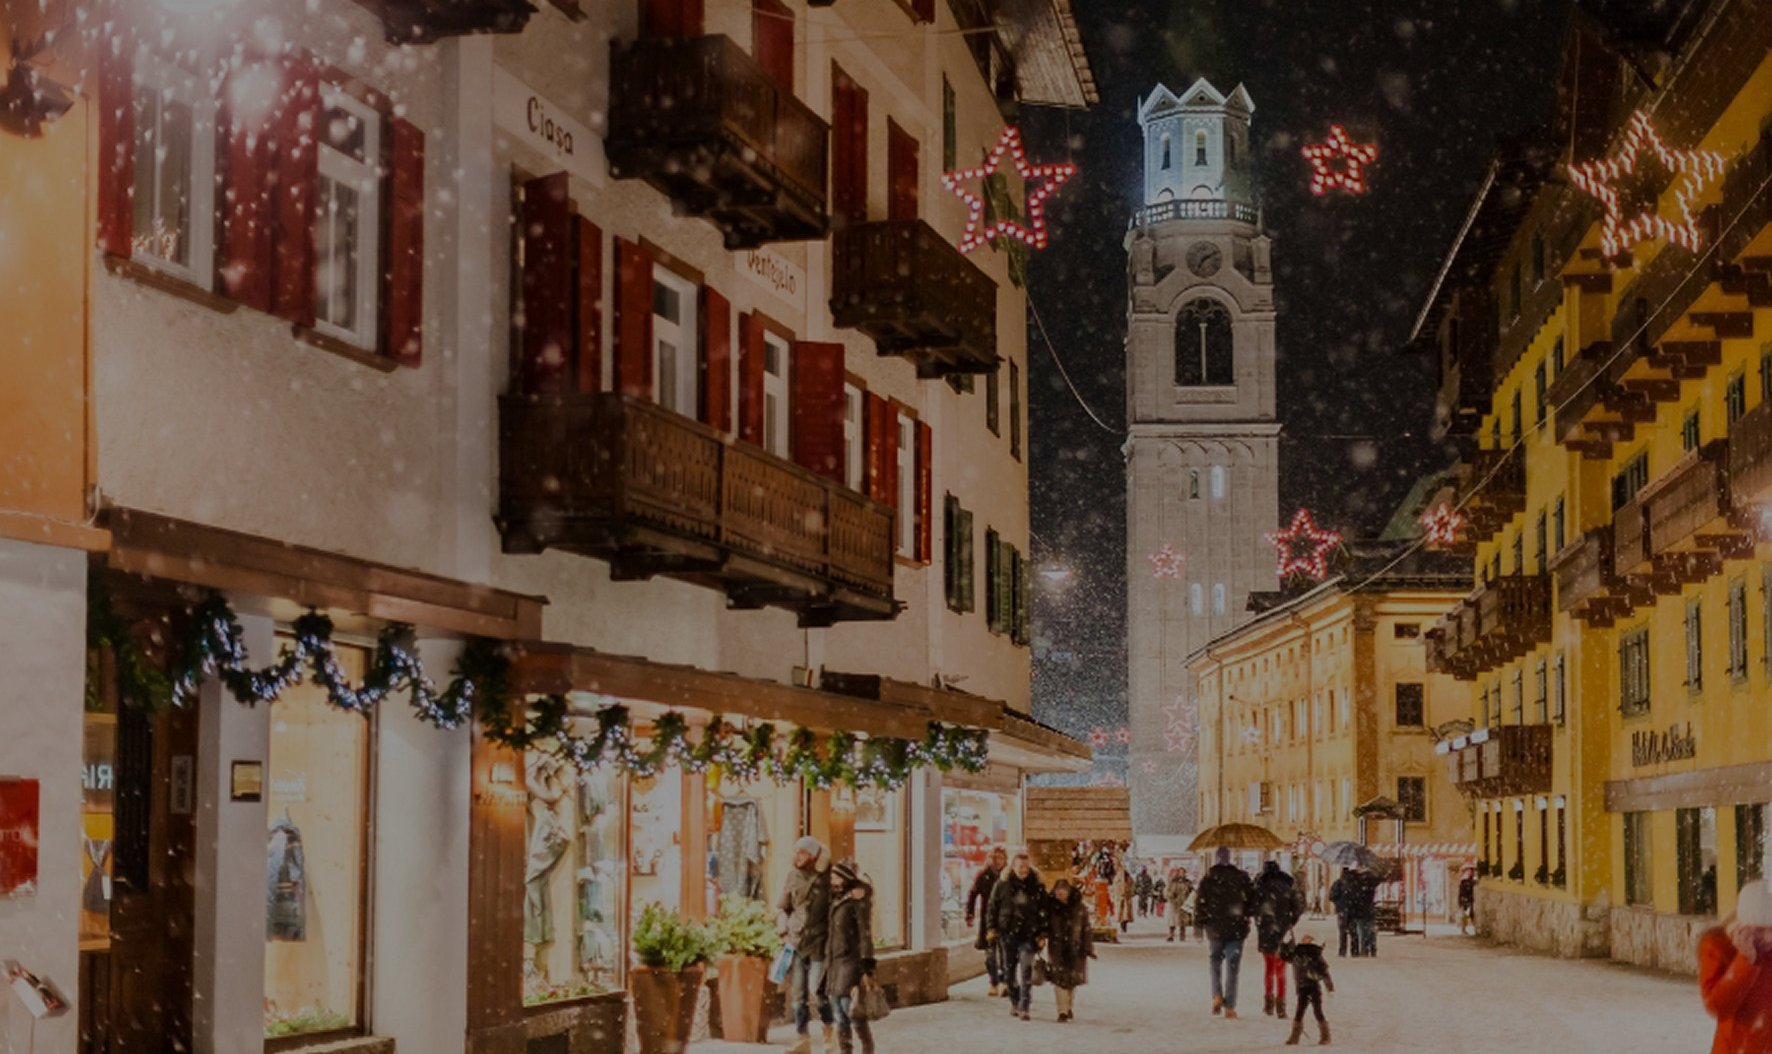 Natale a Cortina d